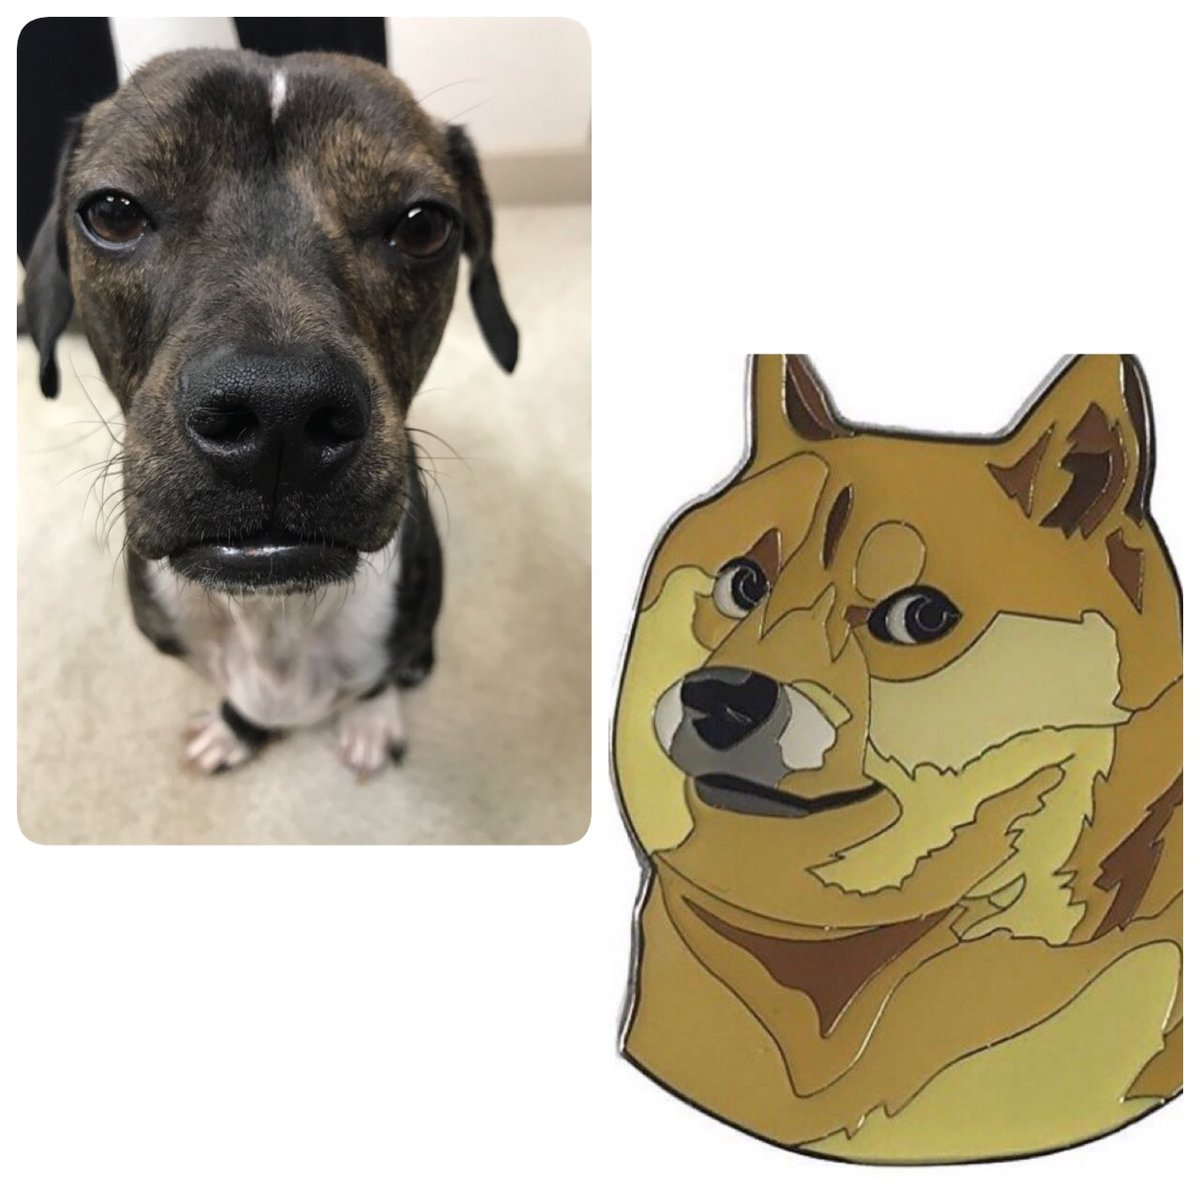 *DOGE NOT AMUSED* *PERFECT PINS*      #doge #dogememe #shibainu #dachshund #memes #enamel pins #lapelpins #pins   https://www. amazon.com/gp/aw/d/B06XS8 YW39/ref=mp_s_a_1_1?ie=UTF8&amp;qid=1500487616&amp;sr=8-1&amp;pi=AC_UL420_SR280,420_QL65&amp;keywords=doge+pin &nbsp; … <br>http://pic.twitter.com/cptrVKHebH